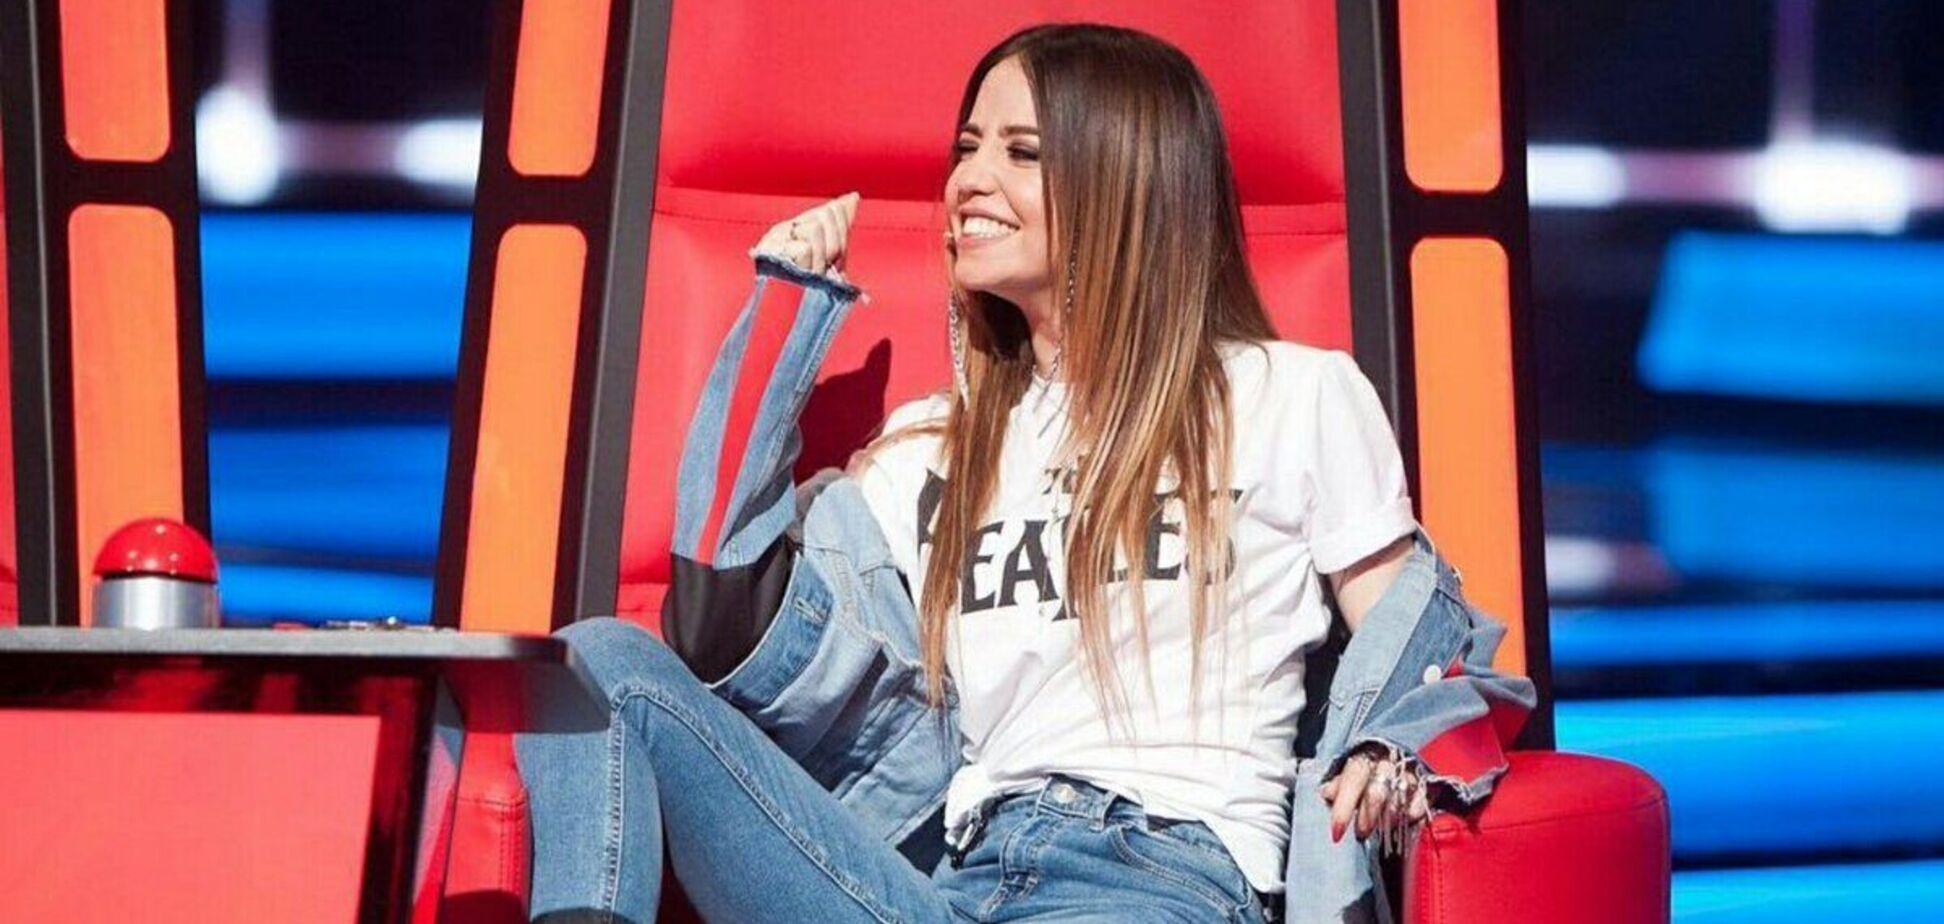 Дорофеева представила оригинальное звучание своей песни на 'Голосі країни-11'